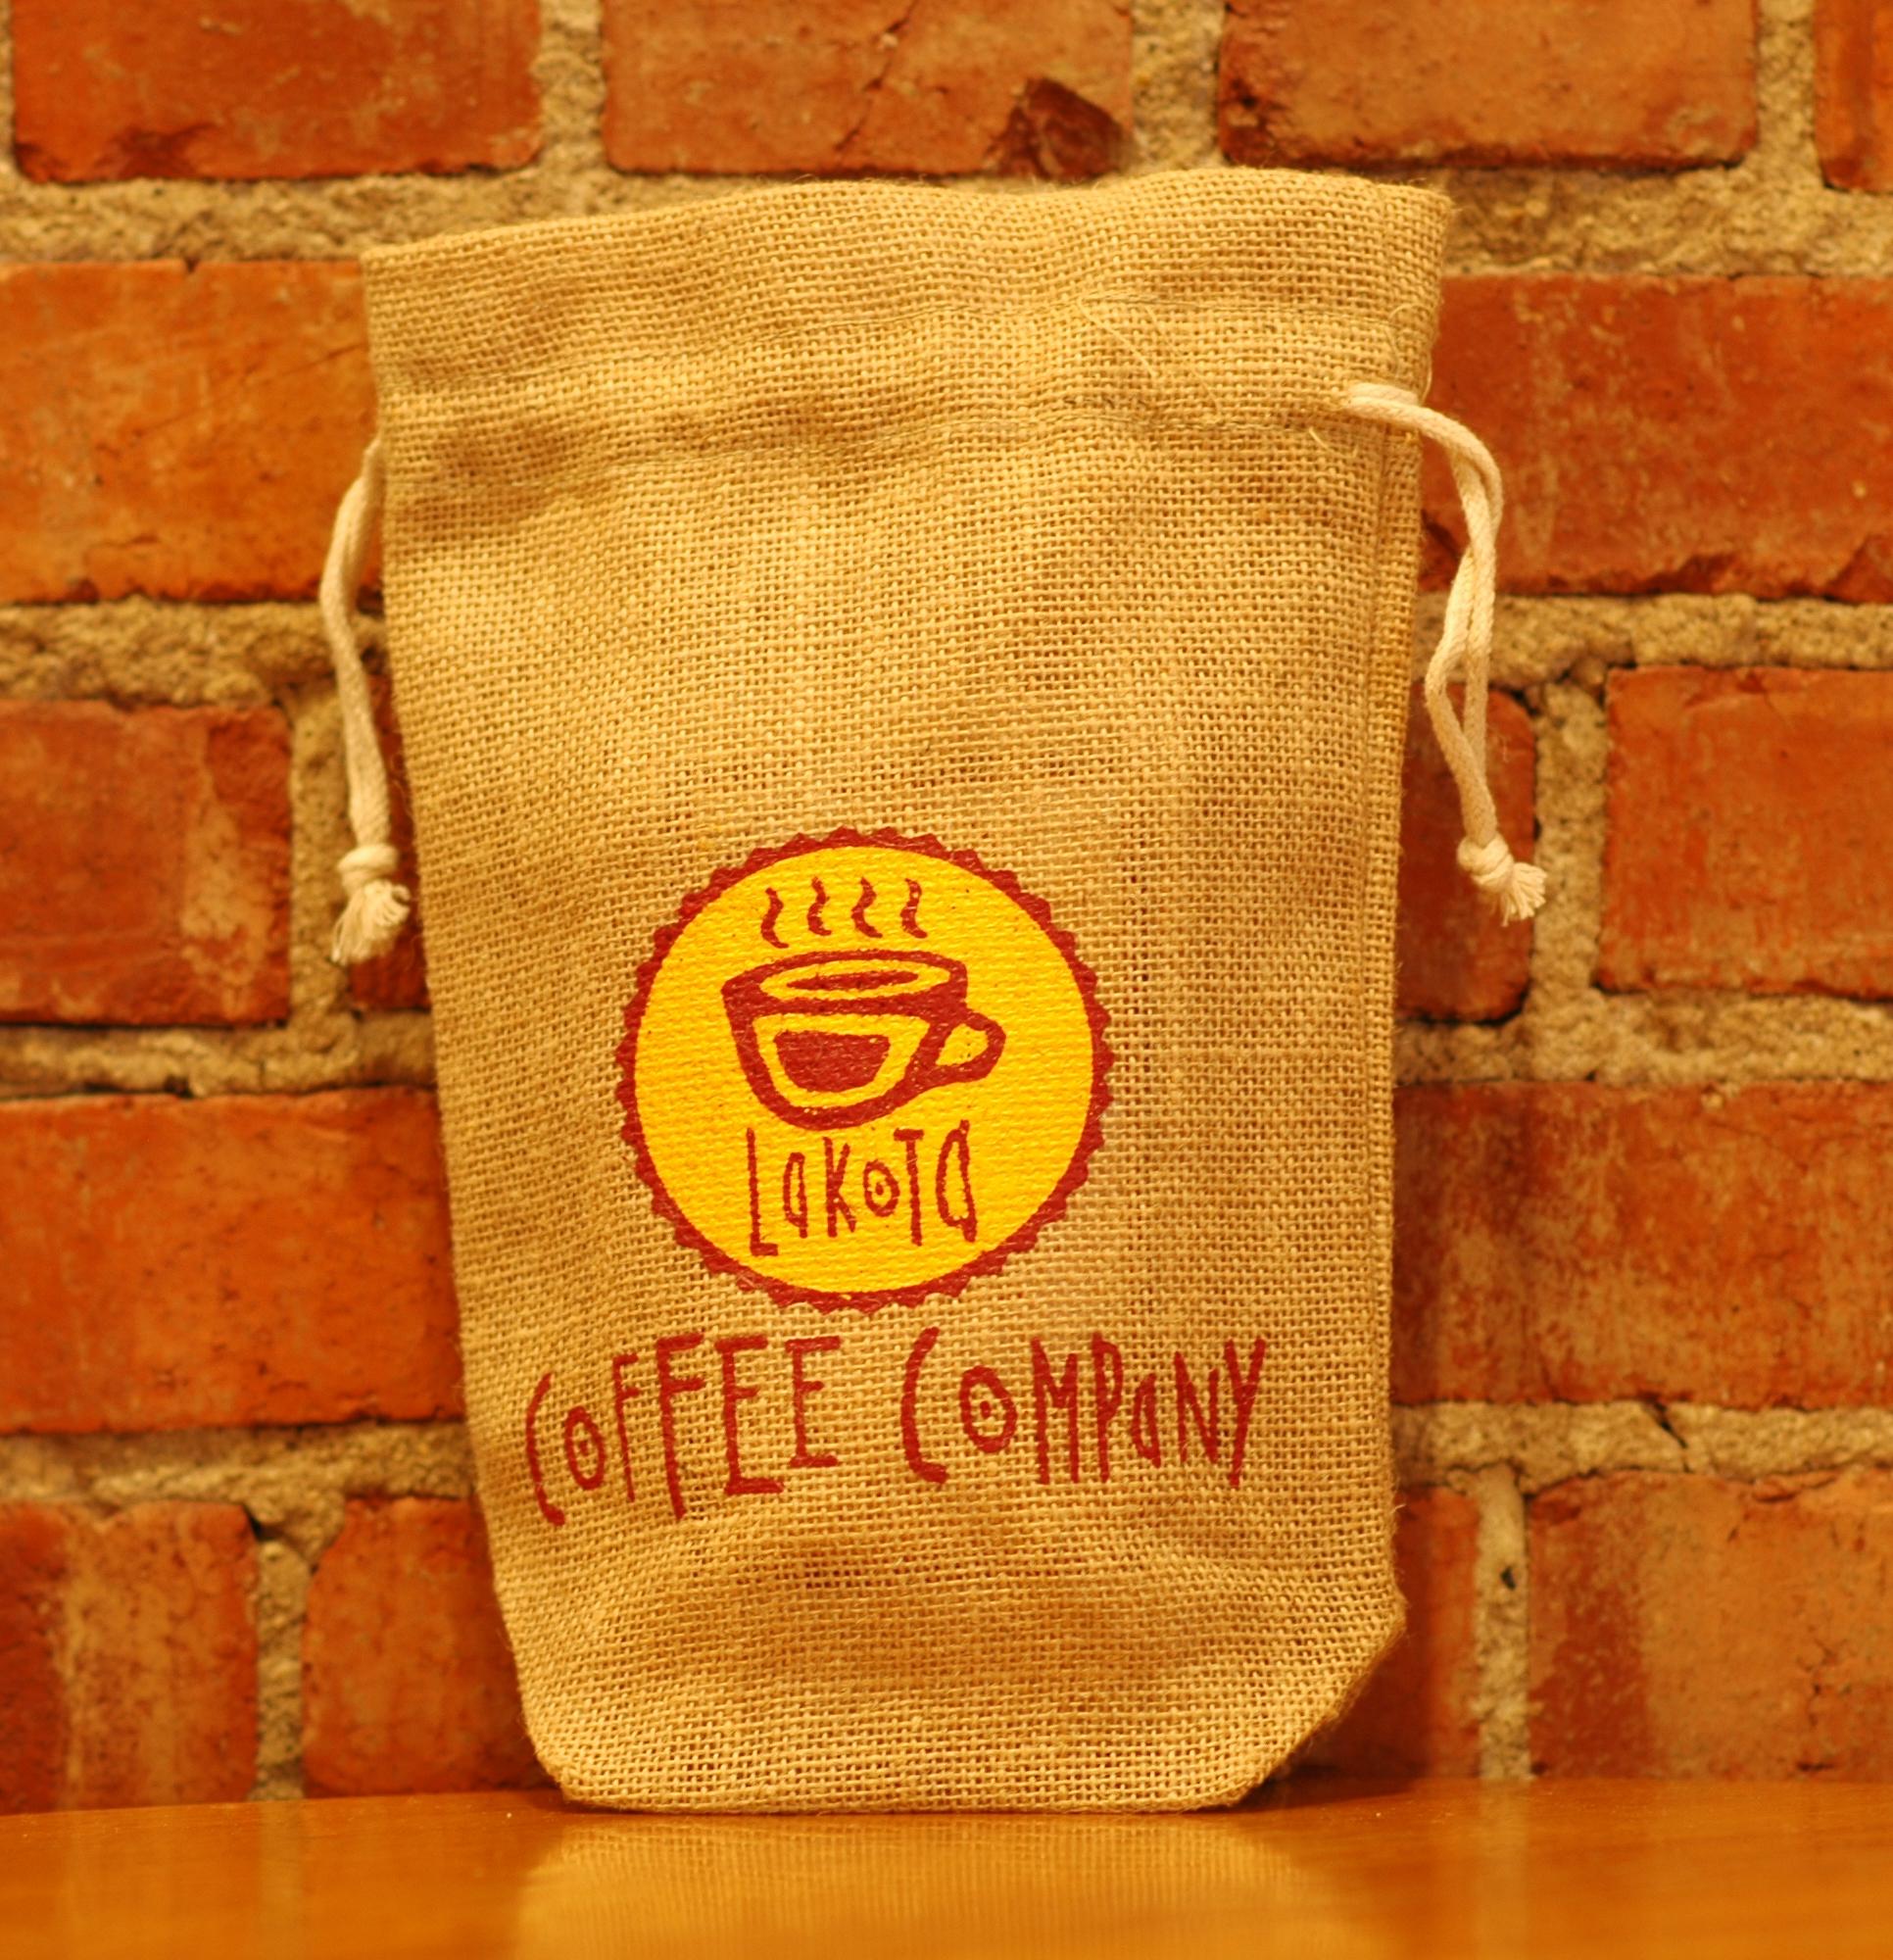 Burlap, drawstring bag with Lakota Coffee Company logo on the front